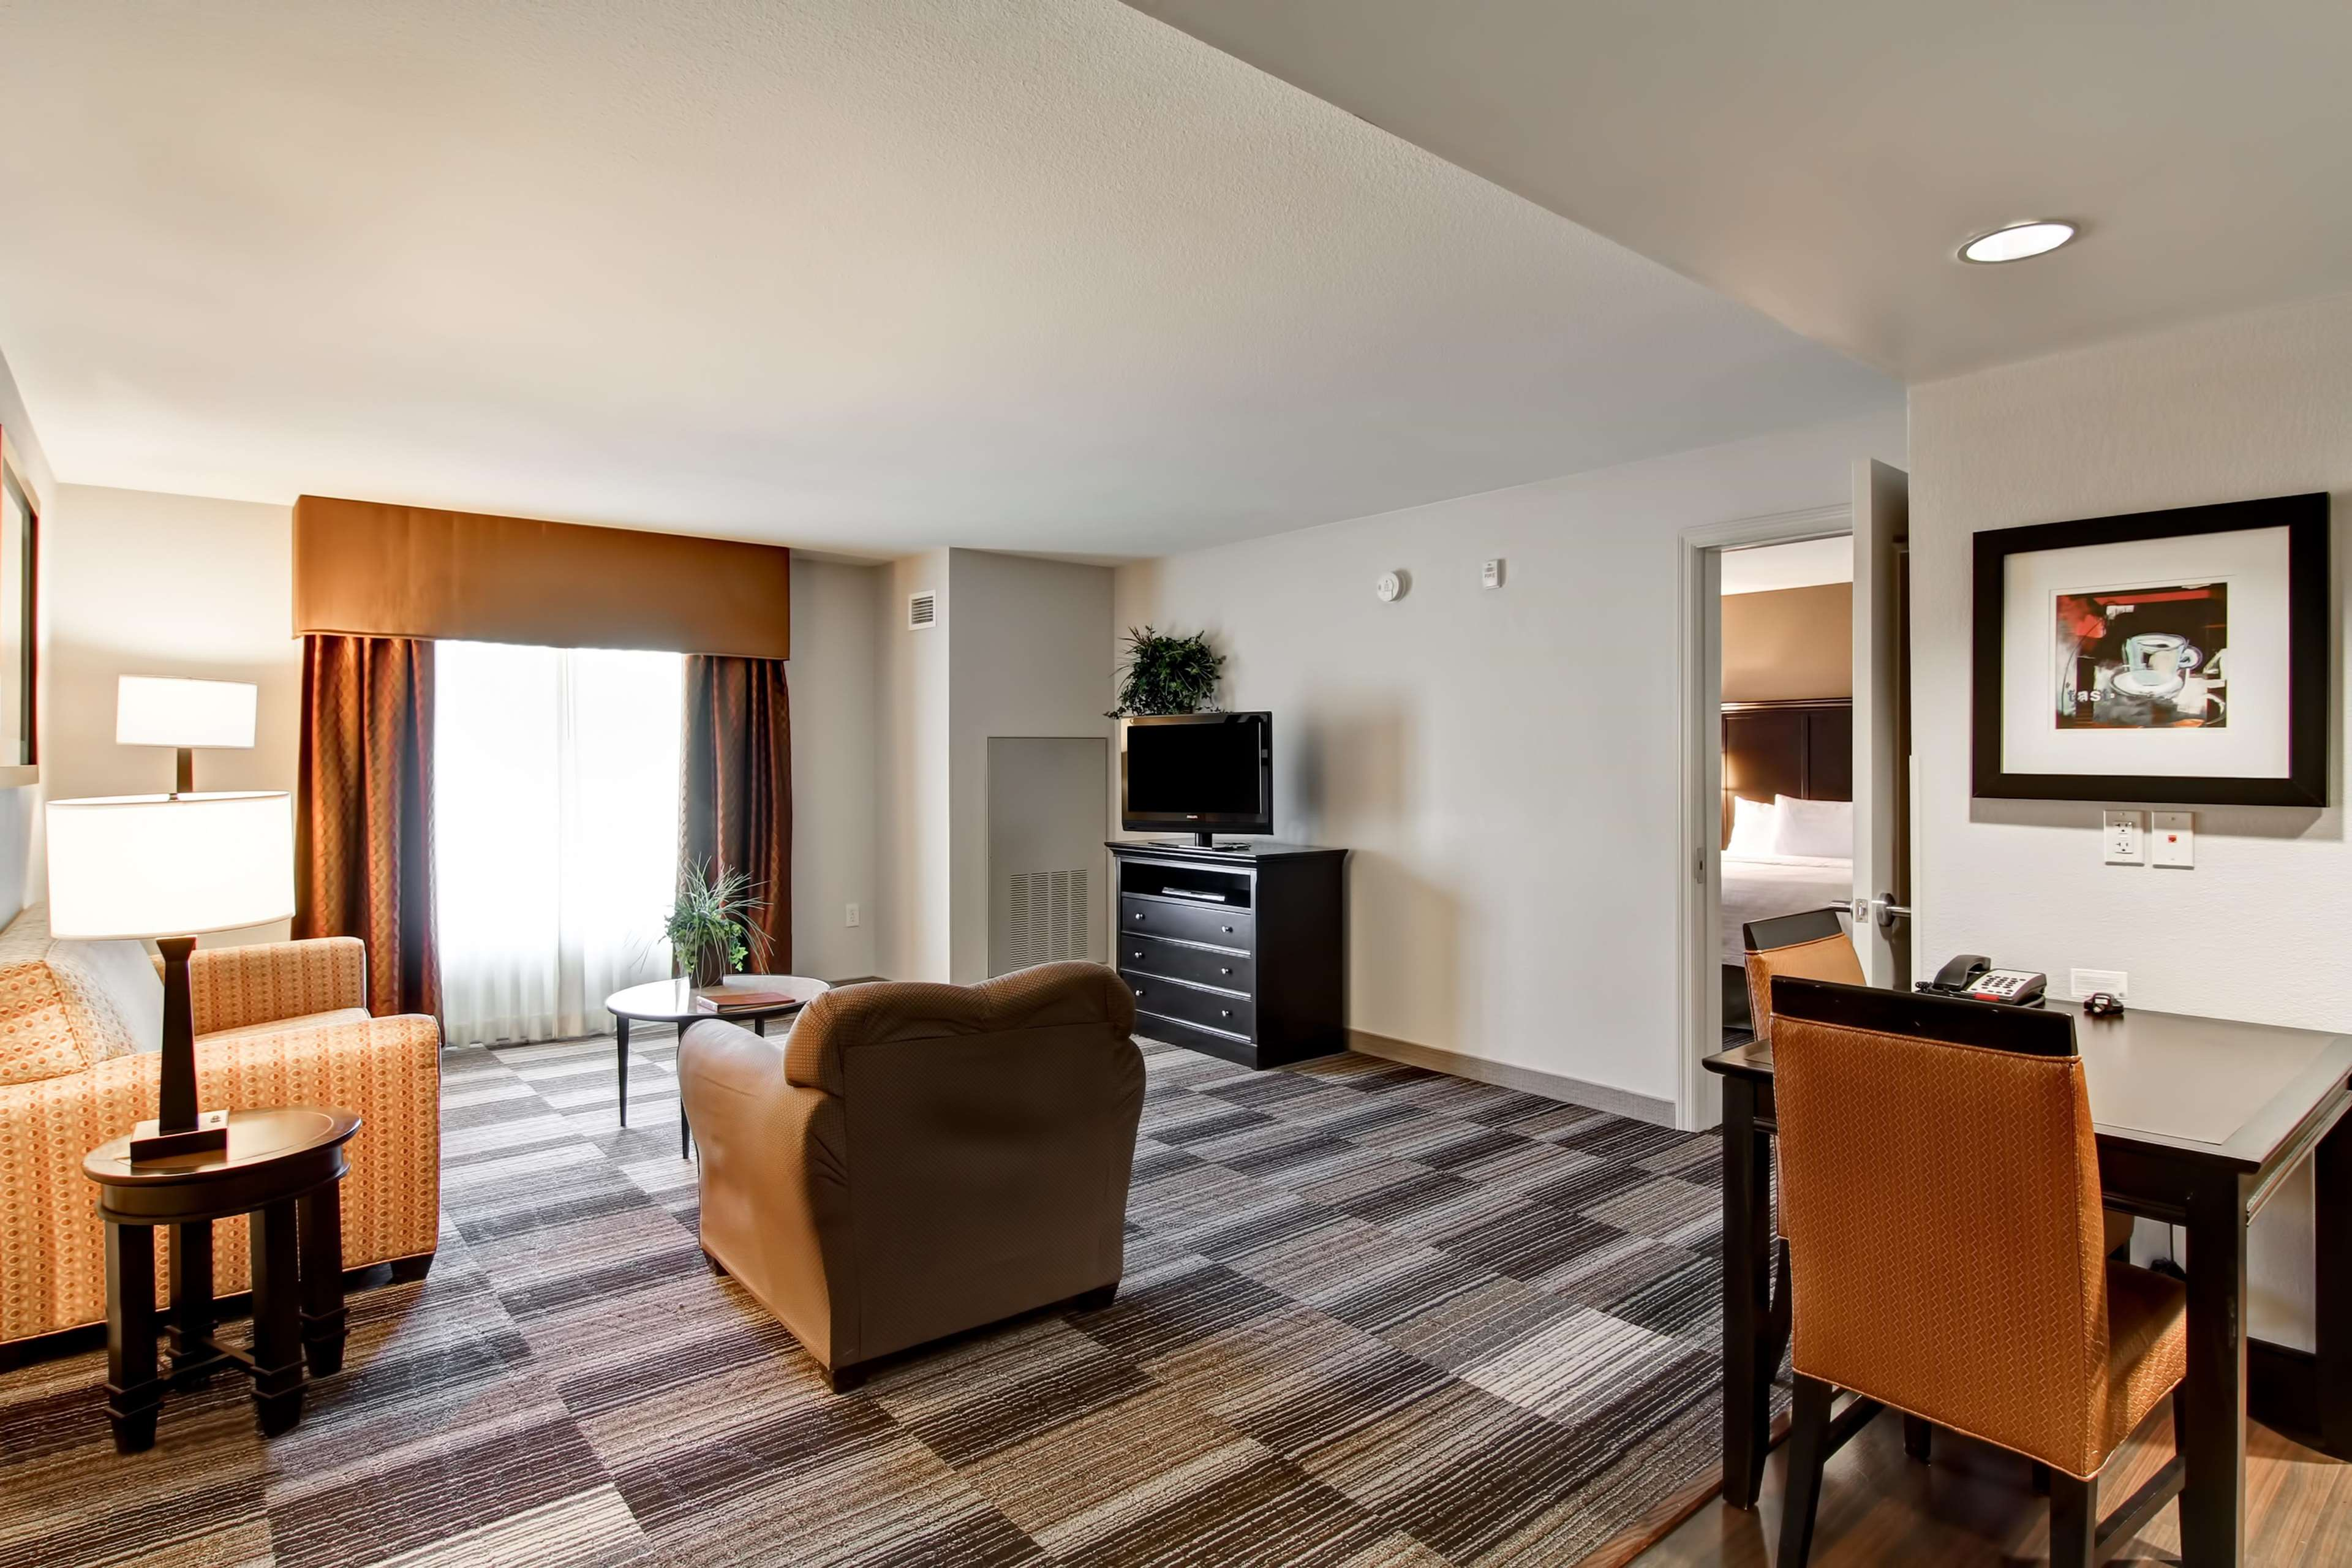 Homewood Suites by Hilton Cincinnati Airport South-Florence image 26